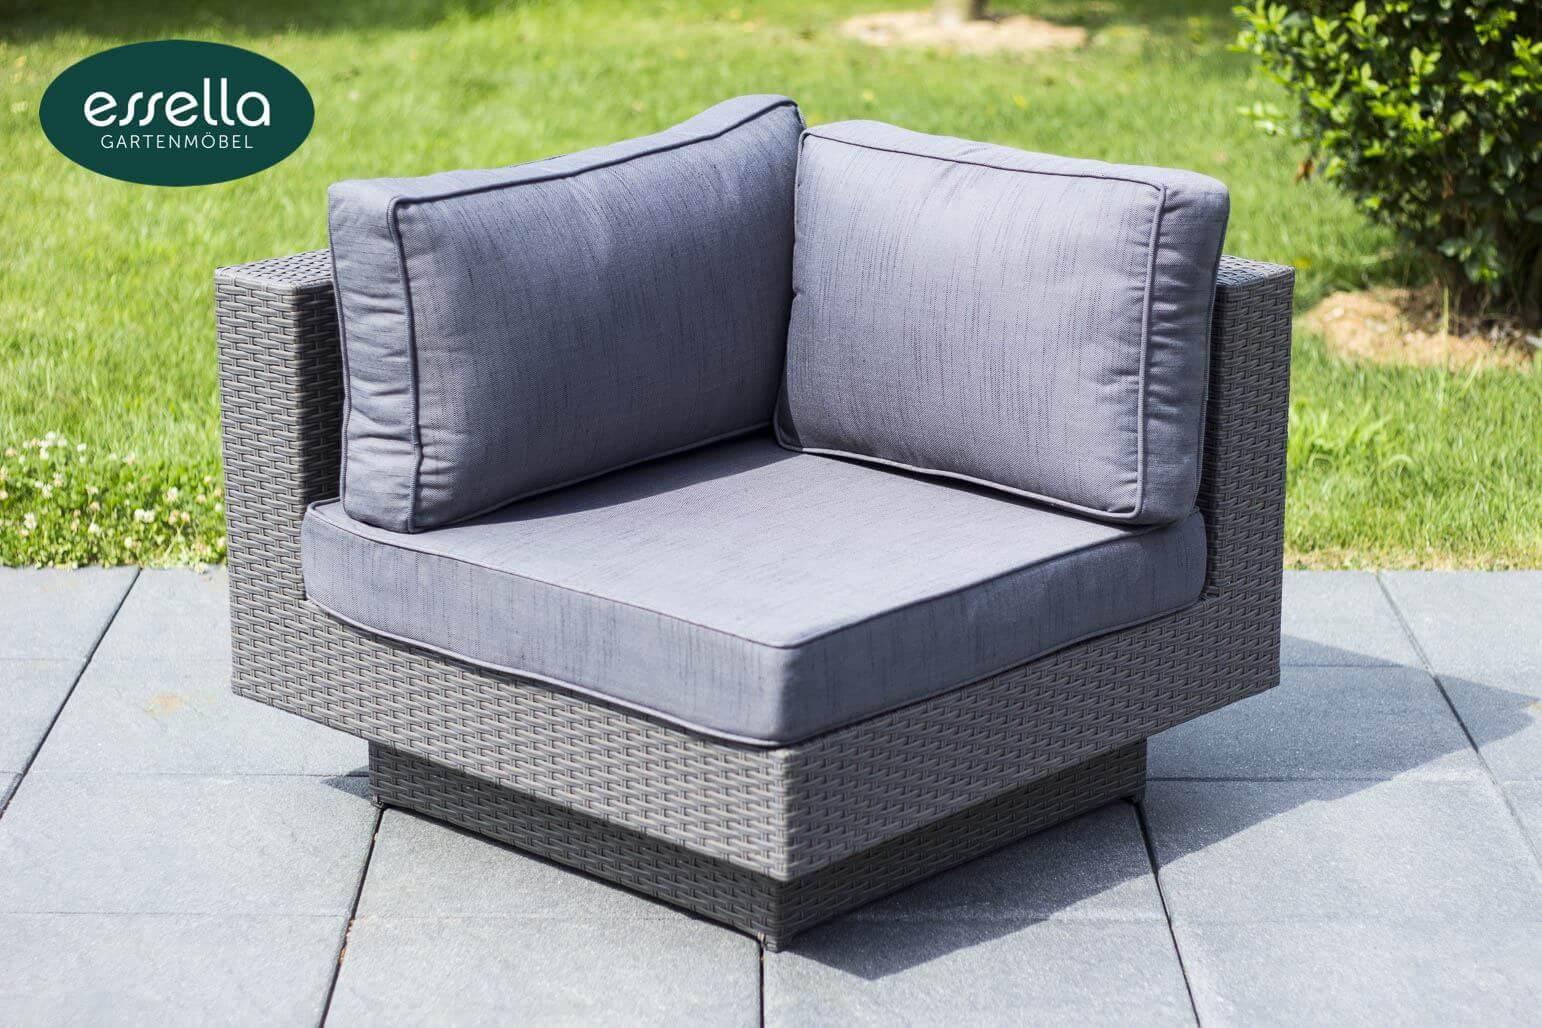 essella polyrattan loungemoebel sitzgruppe melbourne grau flachgeflecht detail 07